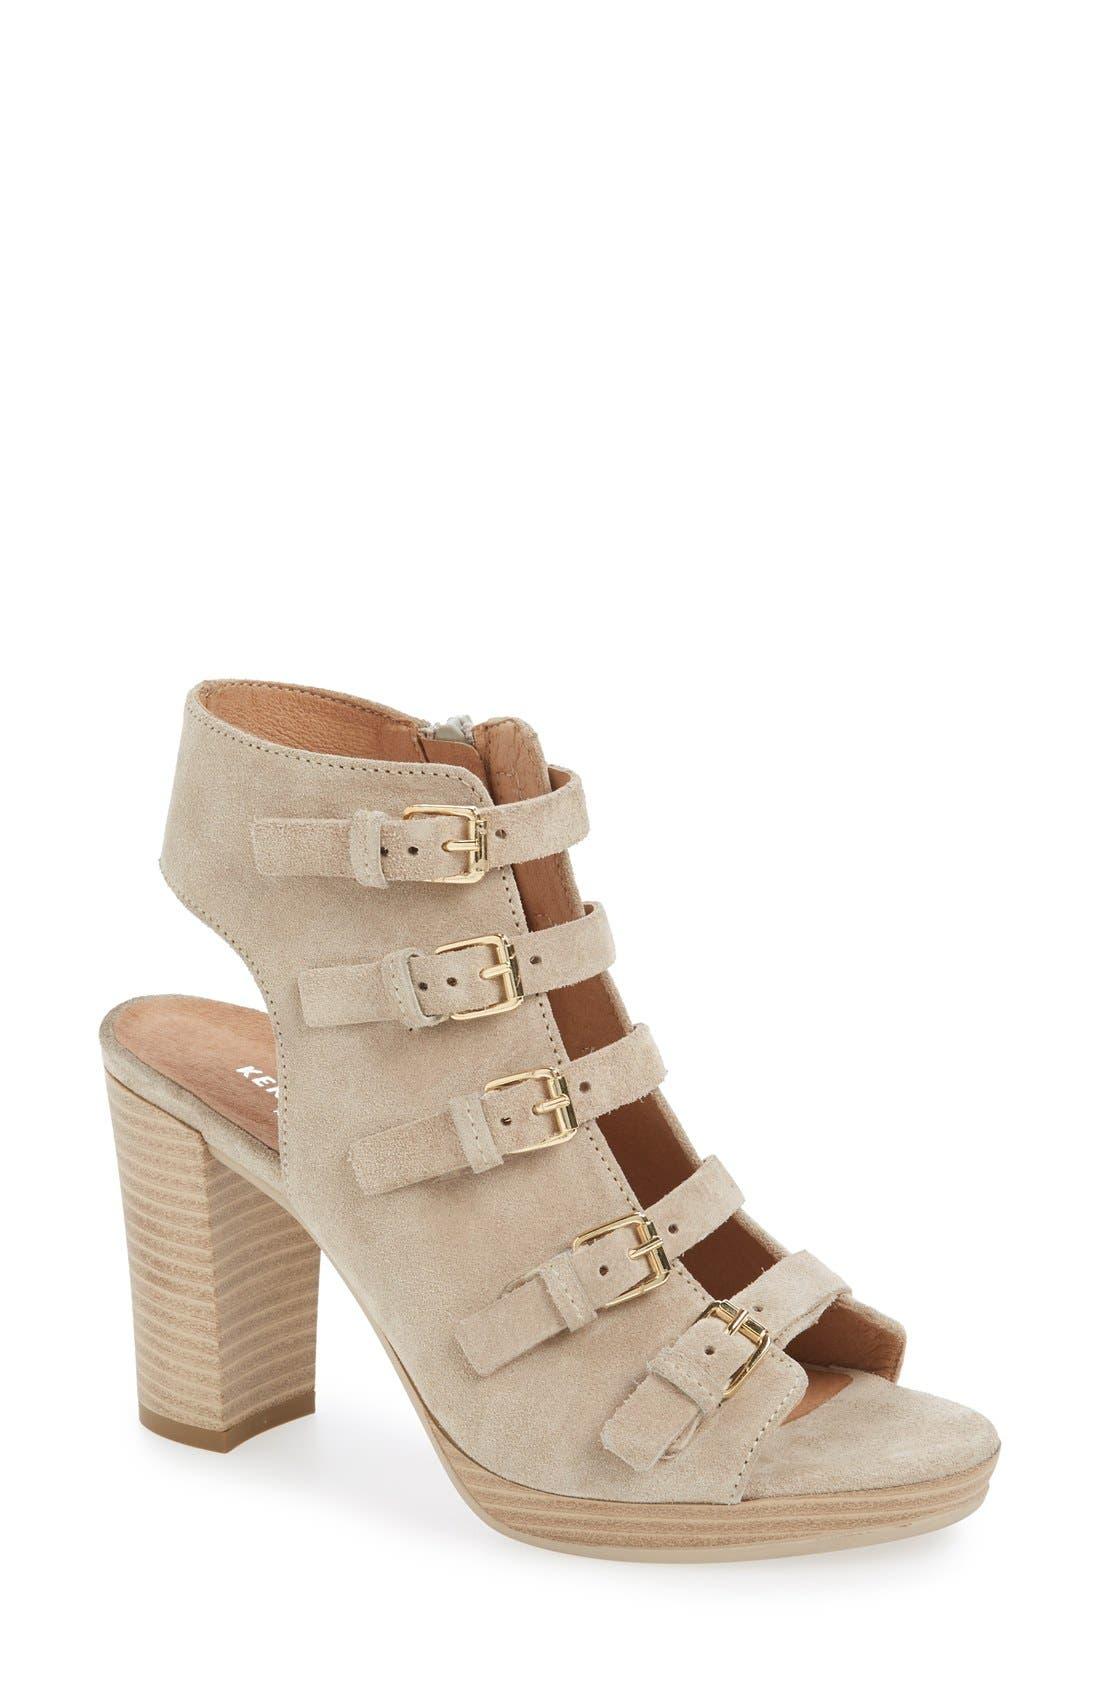 Main Image - Kenneth Cole New York 'Kennedy' Buckle Strap Block Heel Sandal (Women)